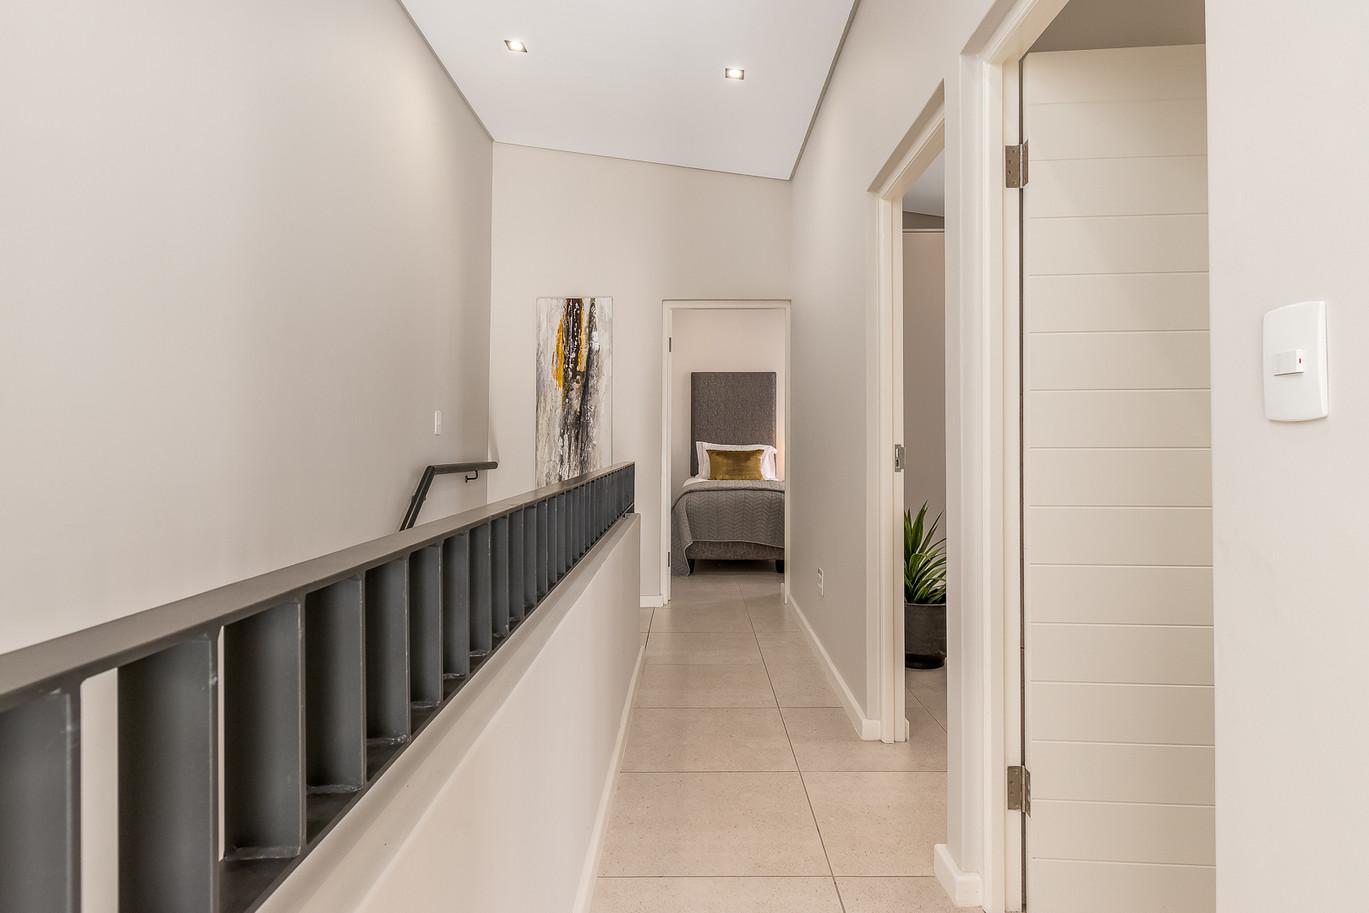 Greystone Hallway 2.jpg